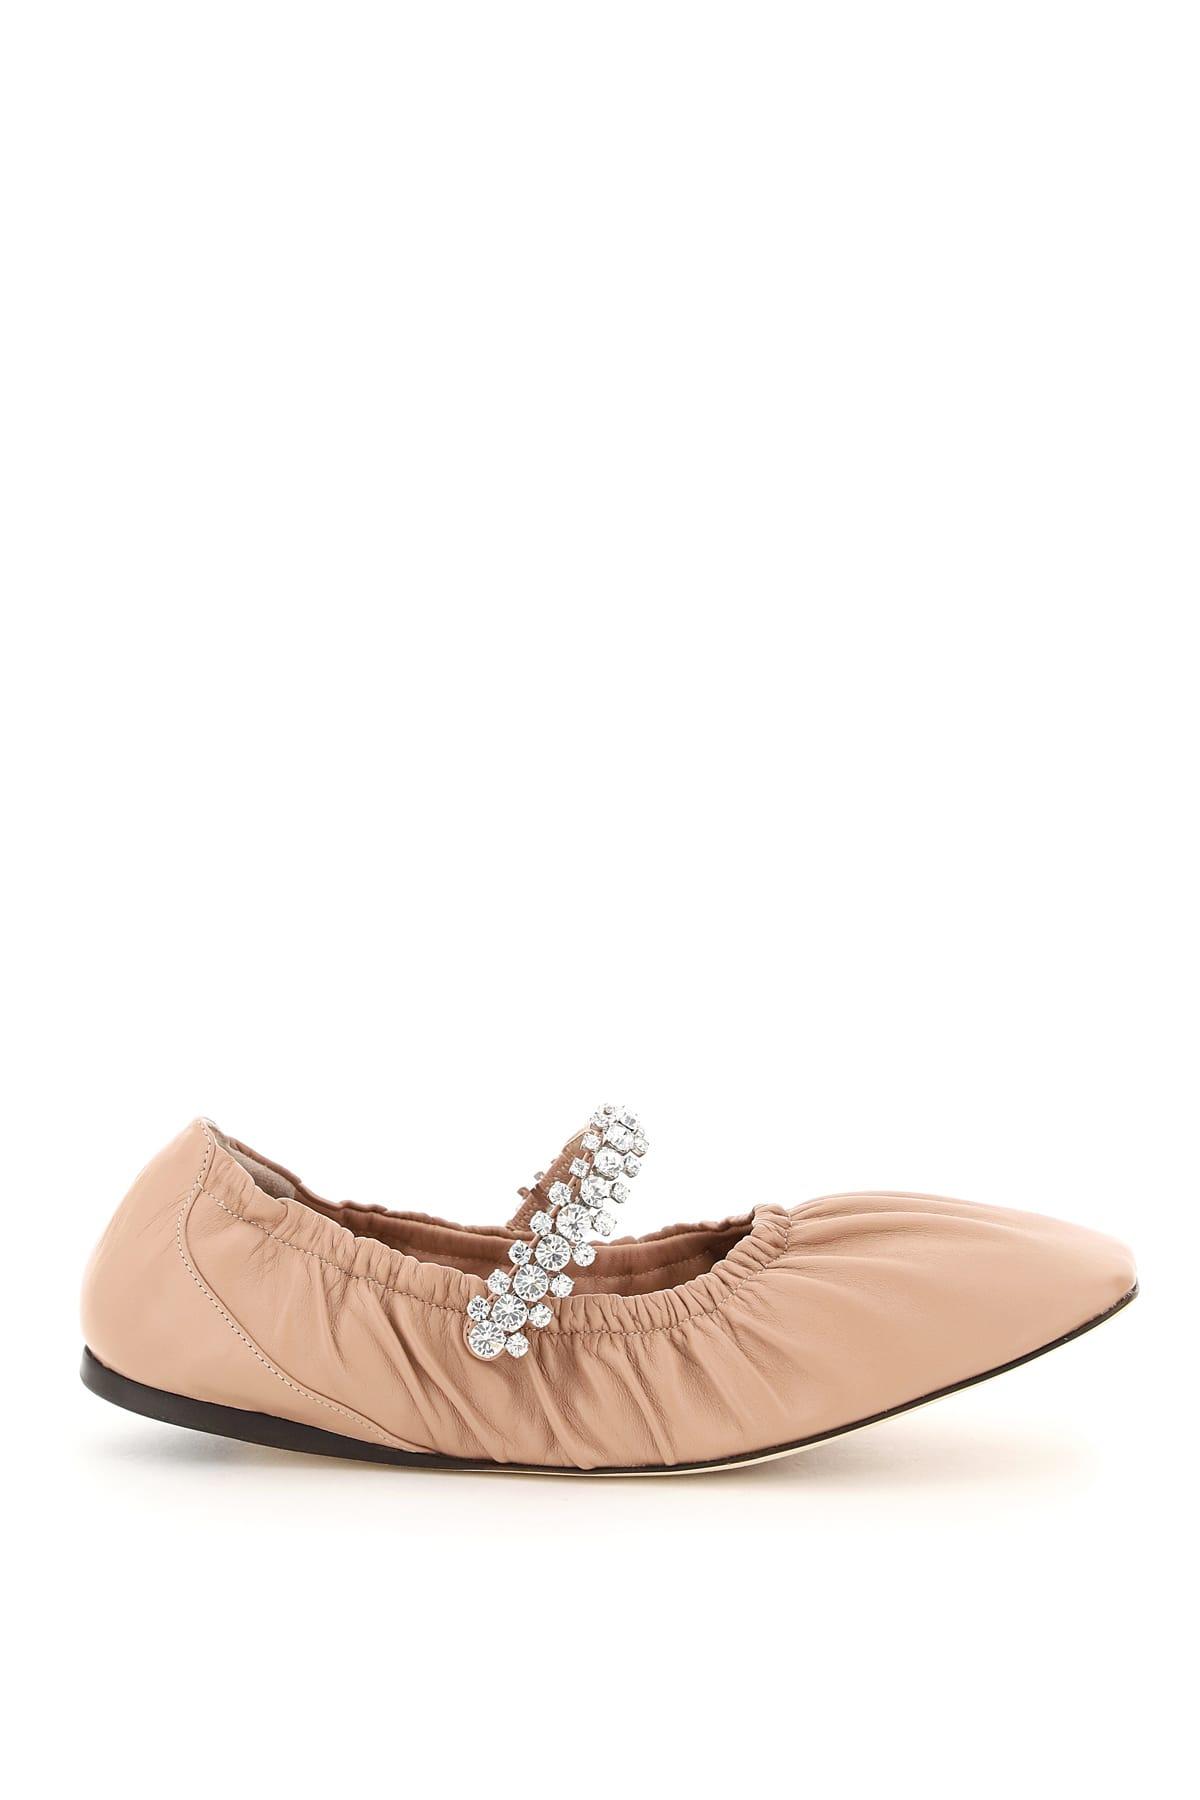 Buy Jimmy Choo Gai Flat Ballerinas Crystal Bracelet online, shop Jimmy Choo shoes with free shipping